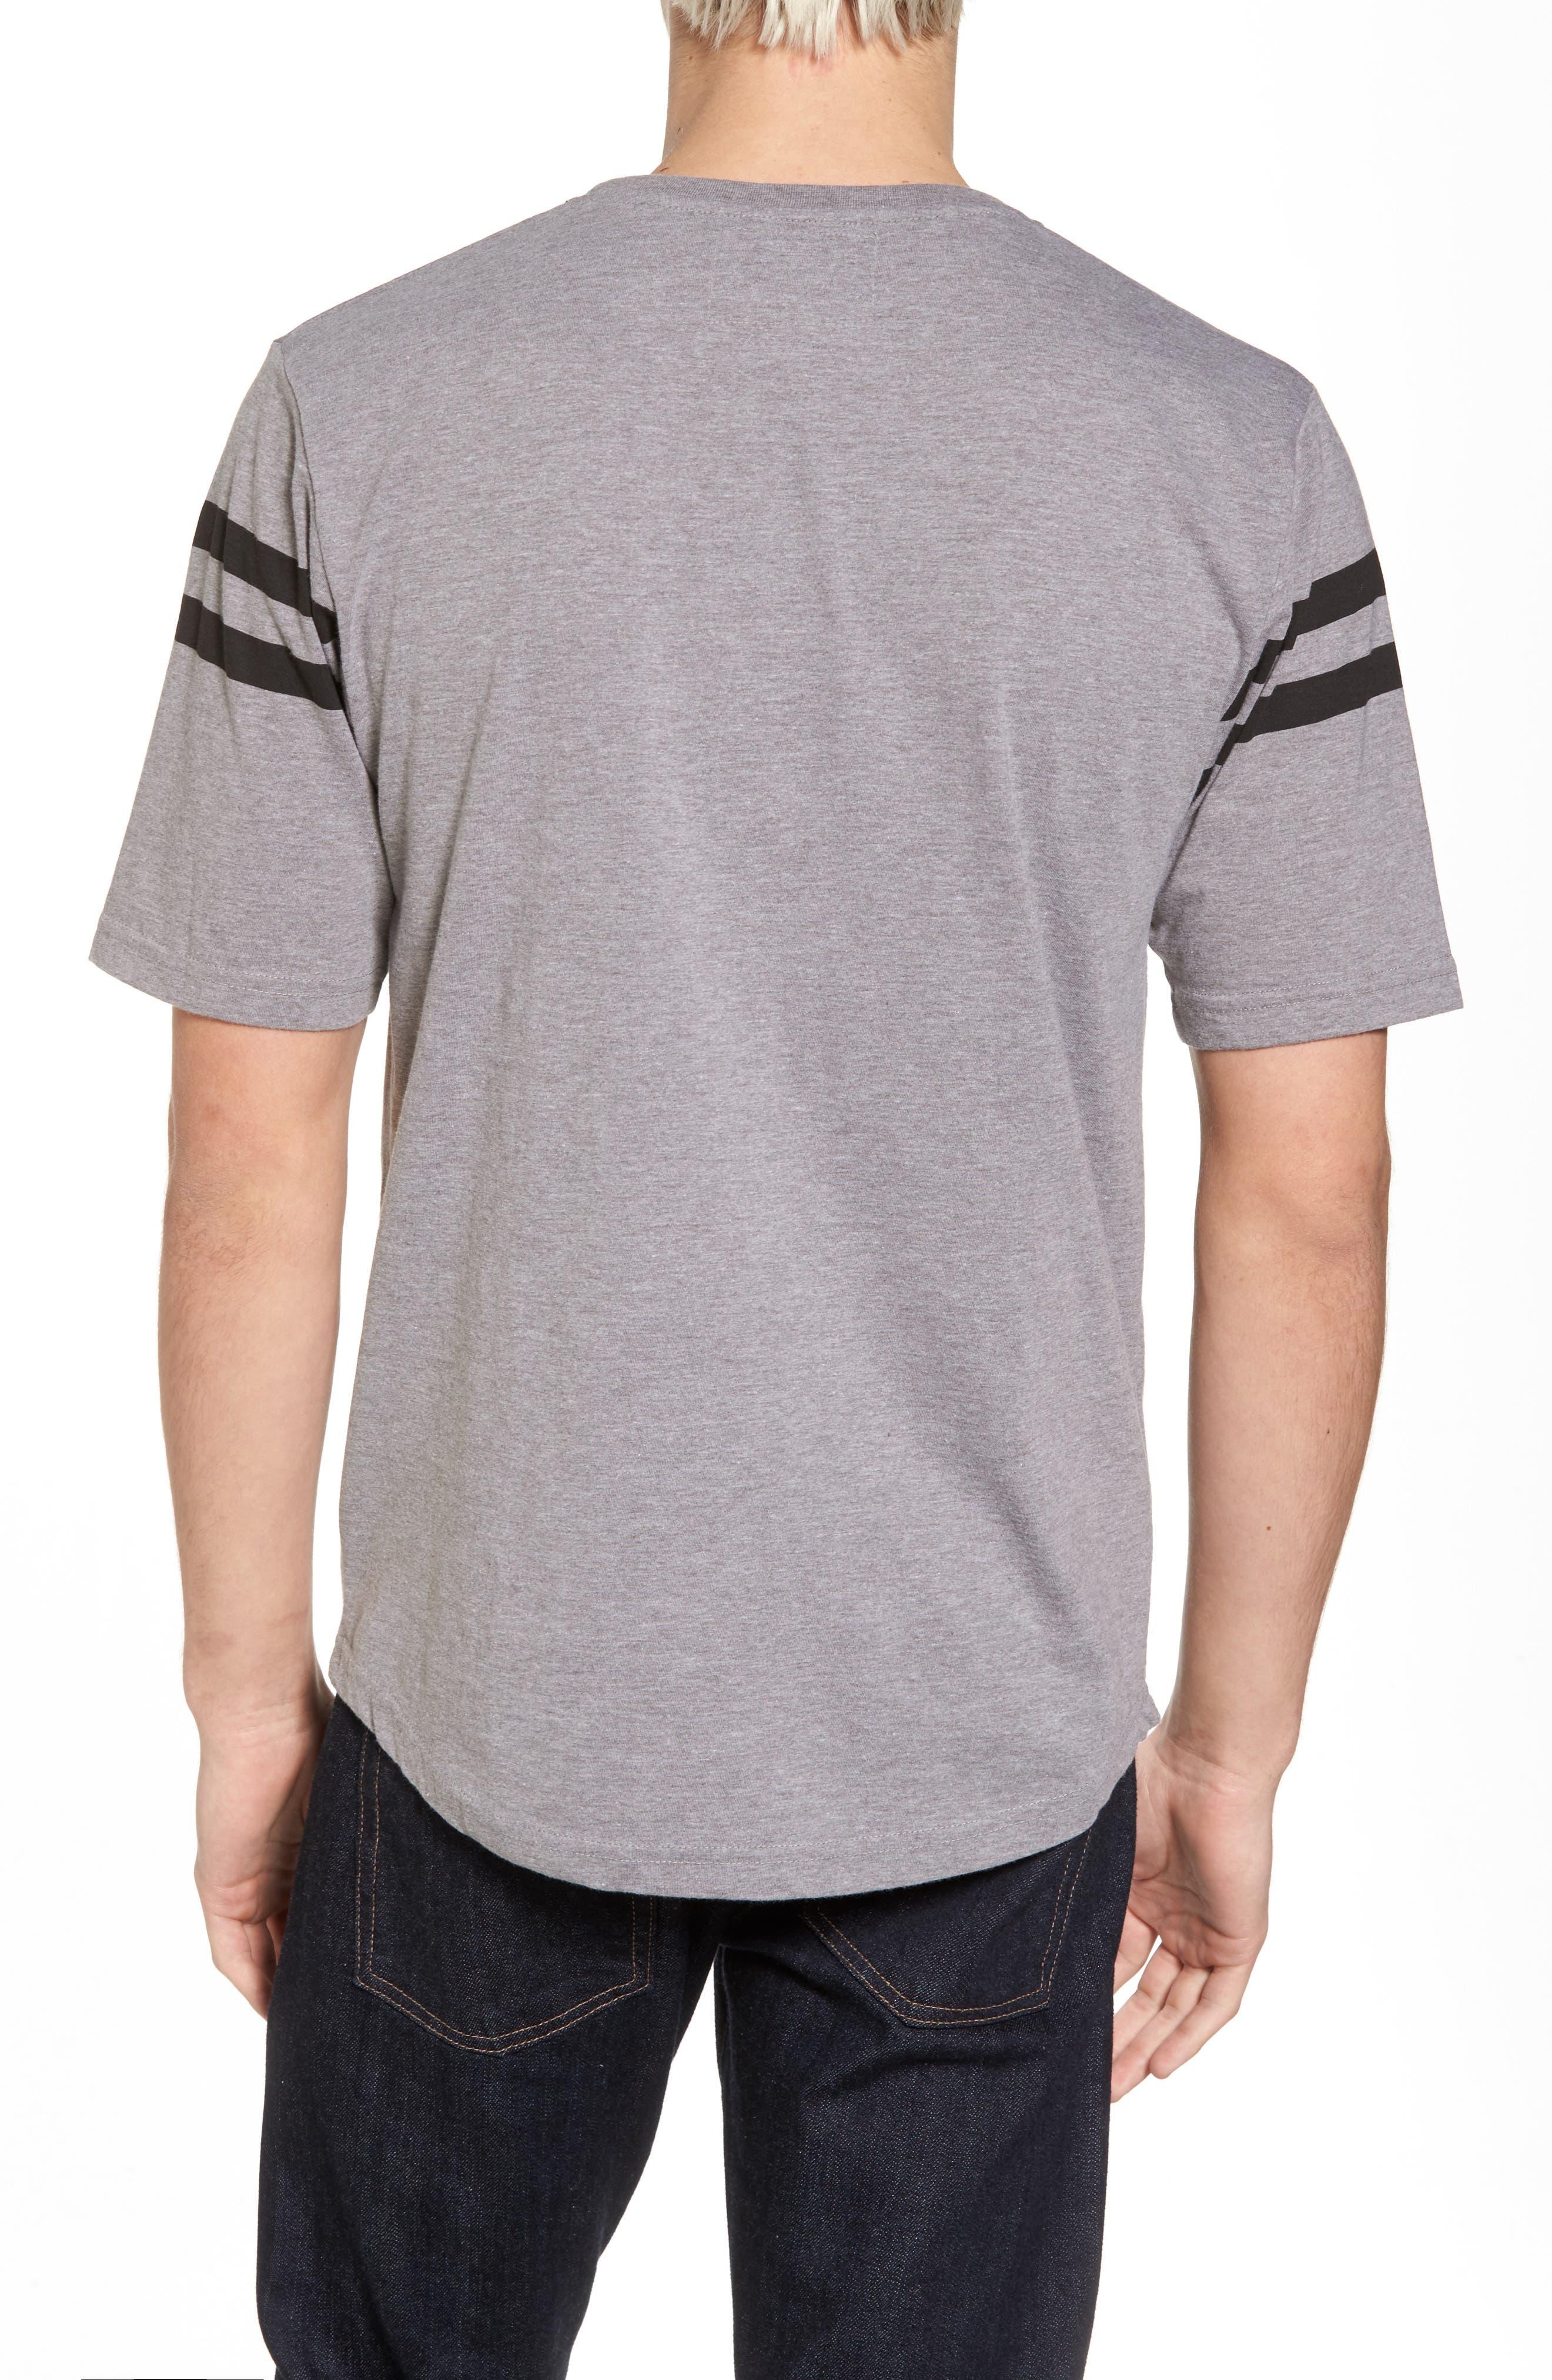 Crosby Boston Bruins T-Shirt,                             Alternate thumbnail 2, color,                             Heather Grey